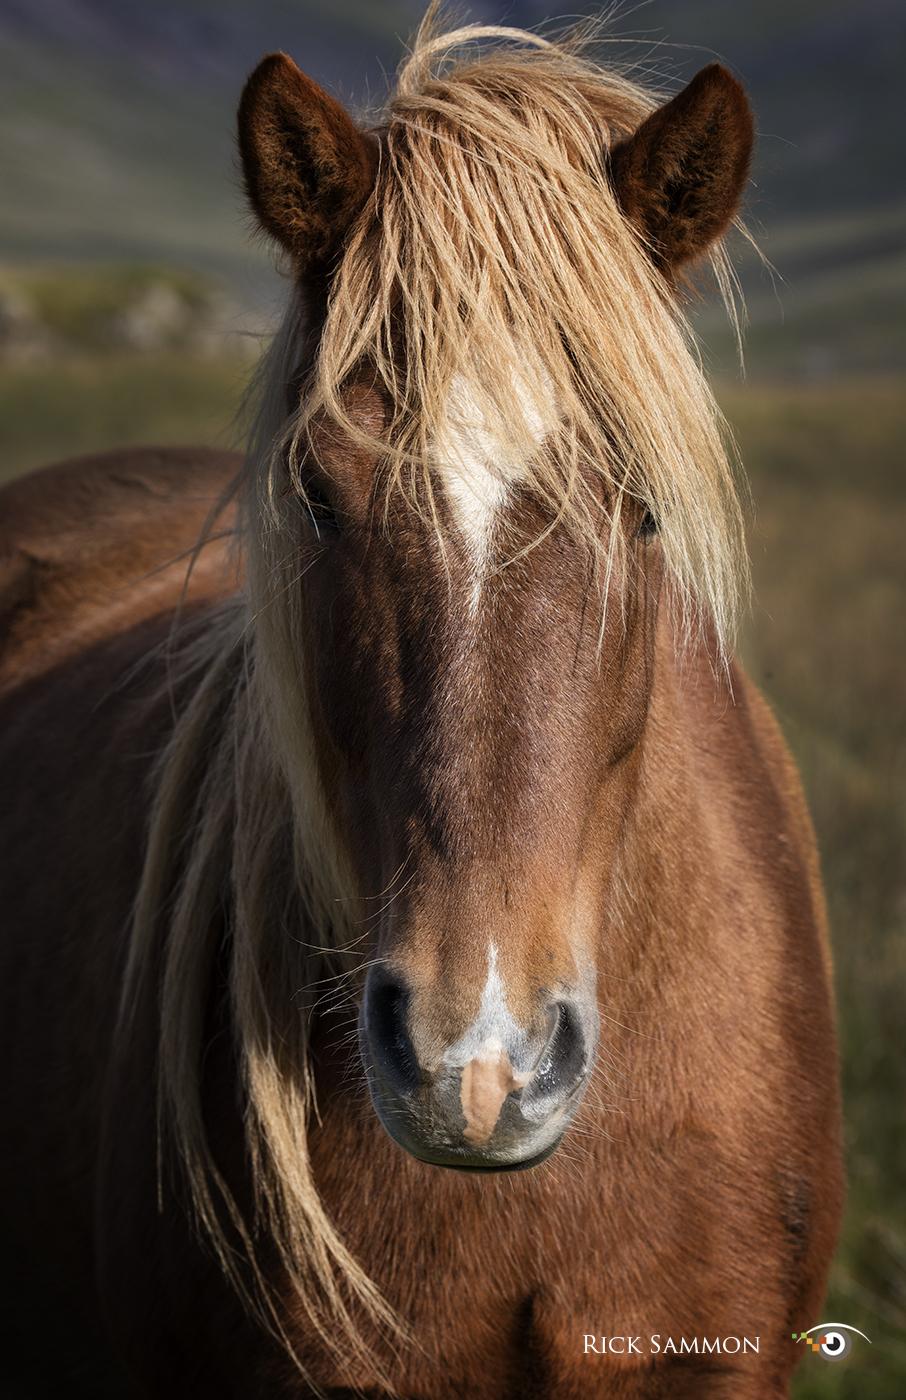 Rick Sammon Iceland Horse.jpg